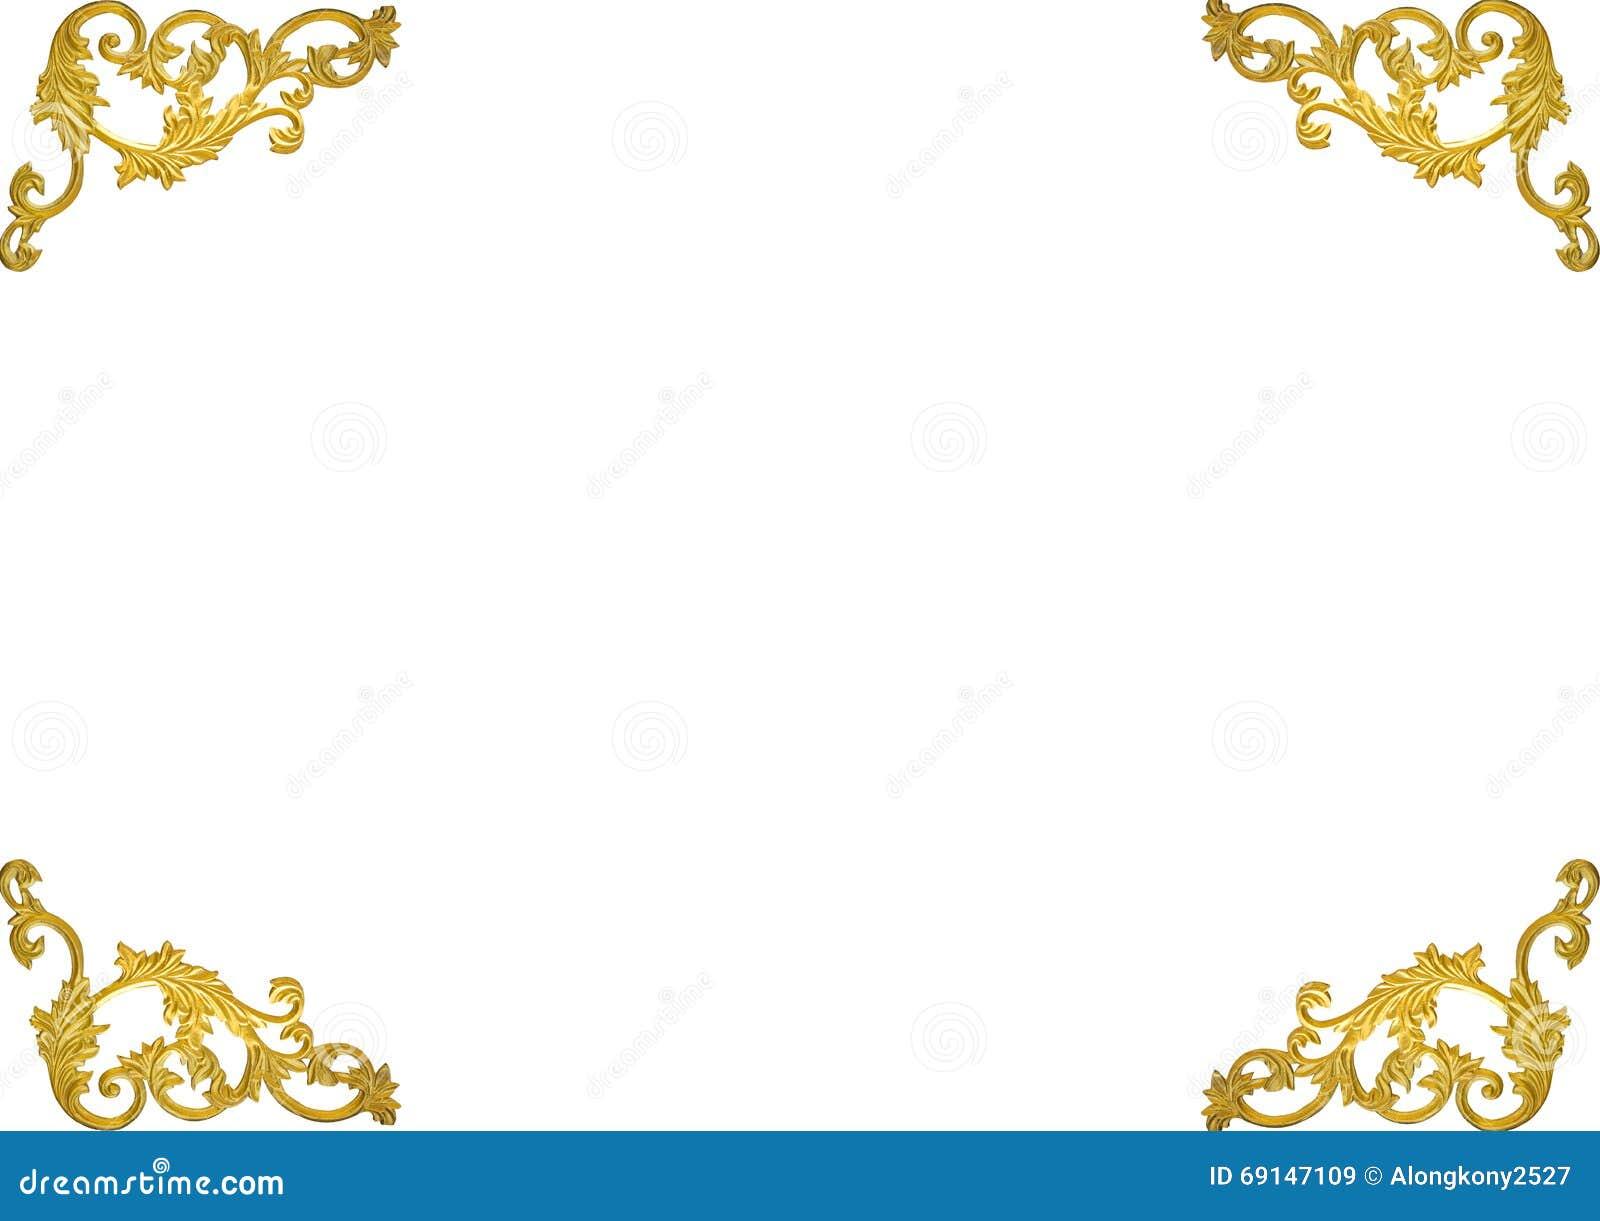 a309ce380a44 Old antique gold frame Stucco walls greek culture roman vintage style  pattern line design for border